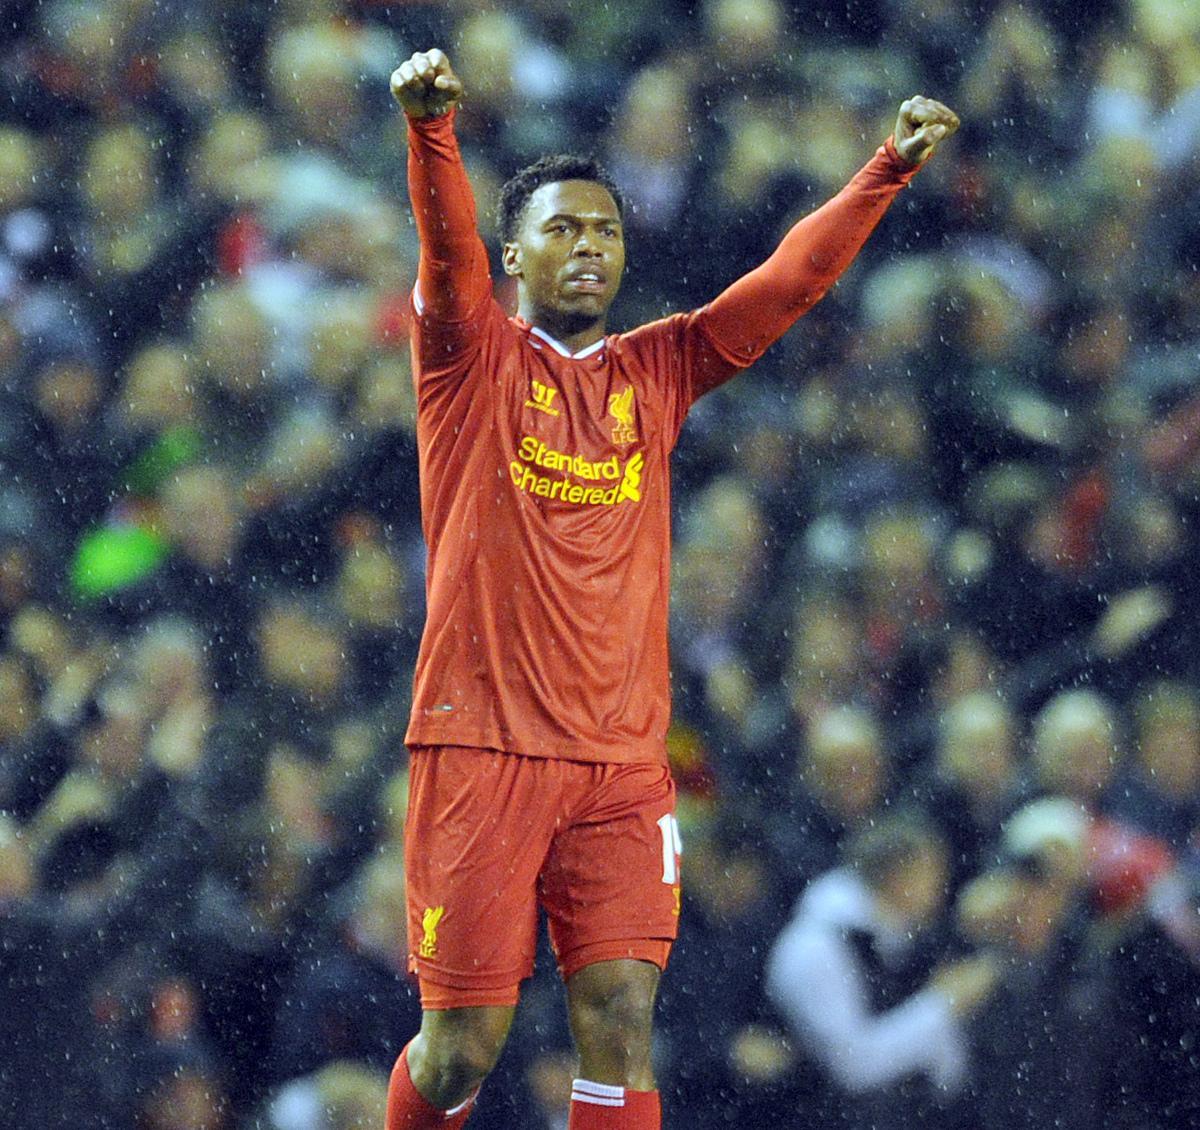 Liverpool 4 0 Borussia Dortmund Match Report Philippe: Analysing Daniel Sturridge's Performance Vs. Everton